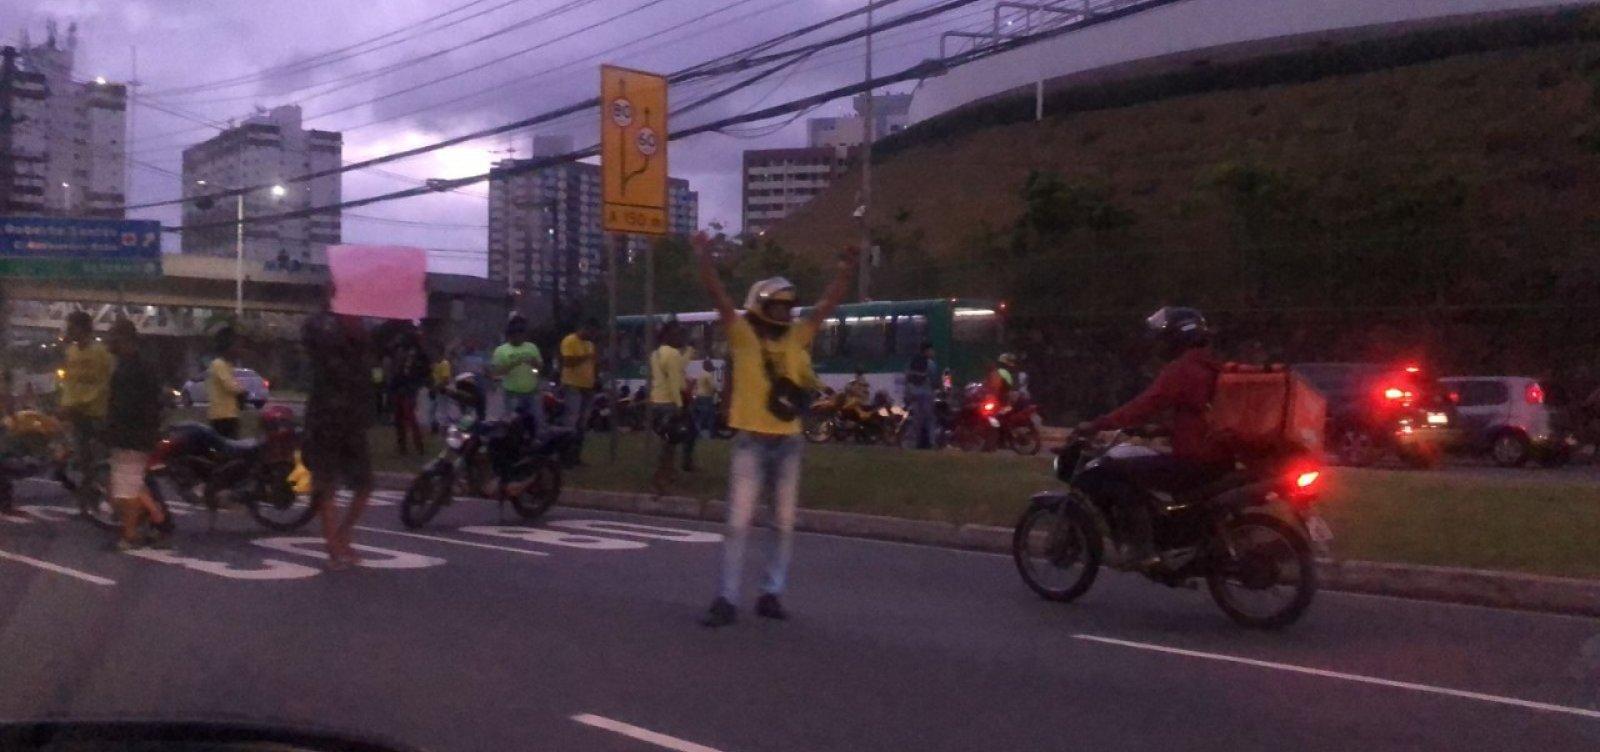 Contra aumento no preço de gasolina, protesto de mototaxistas trava Avenida Paralela; veja vídeo